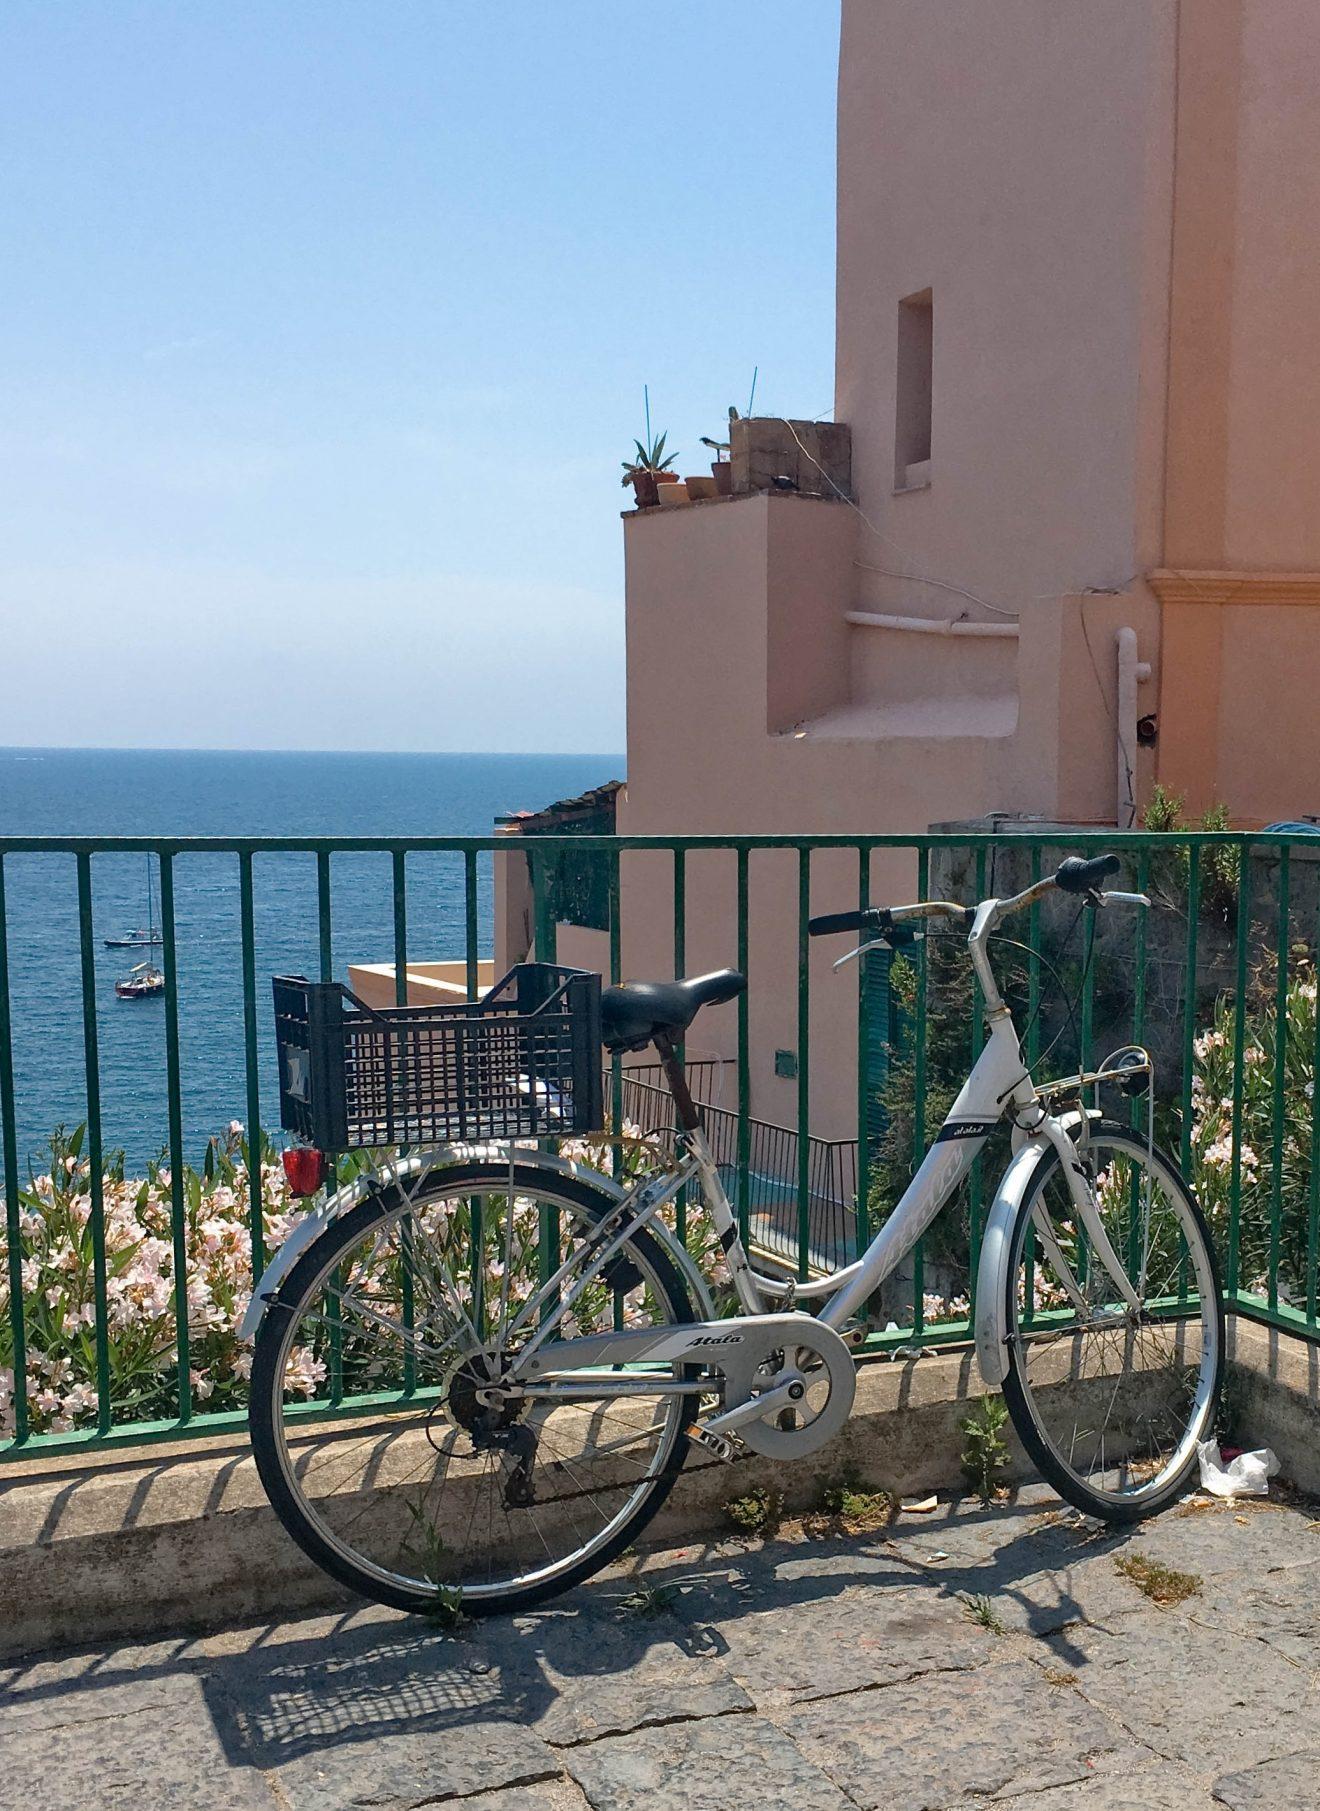 Vélo en face de la mer à Amalfi